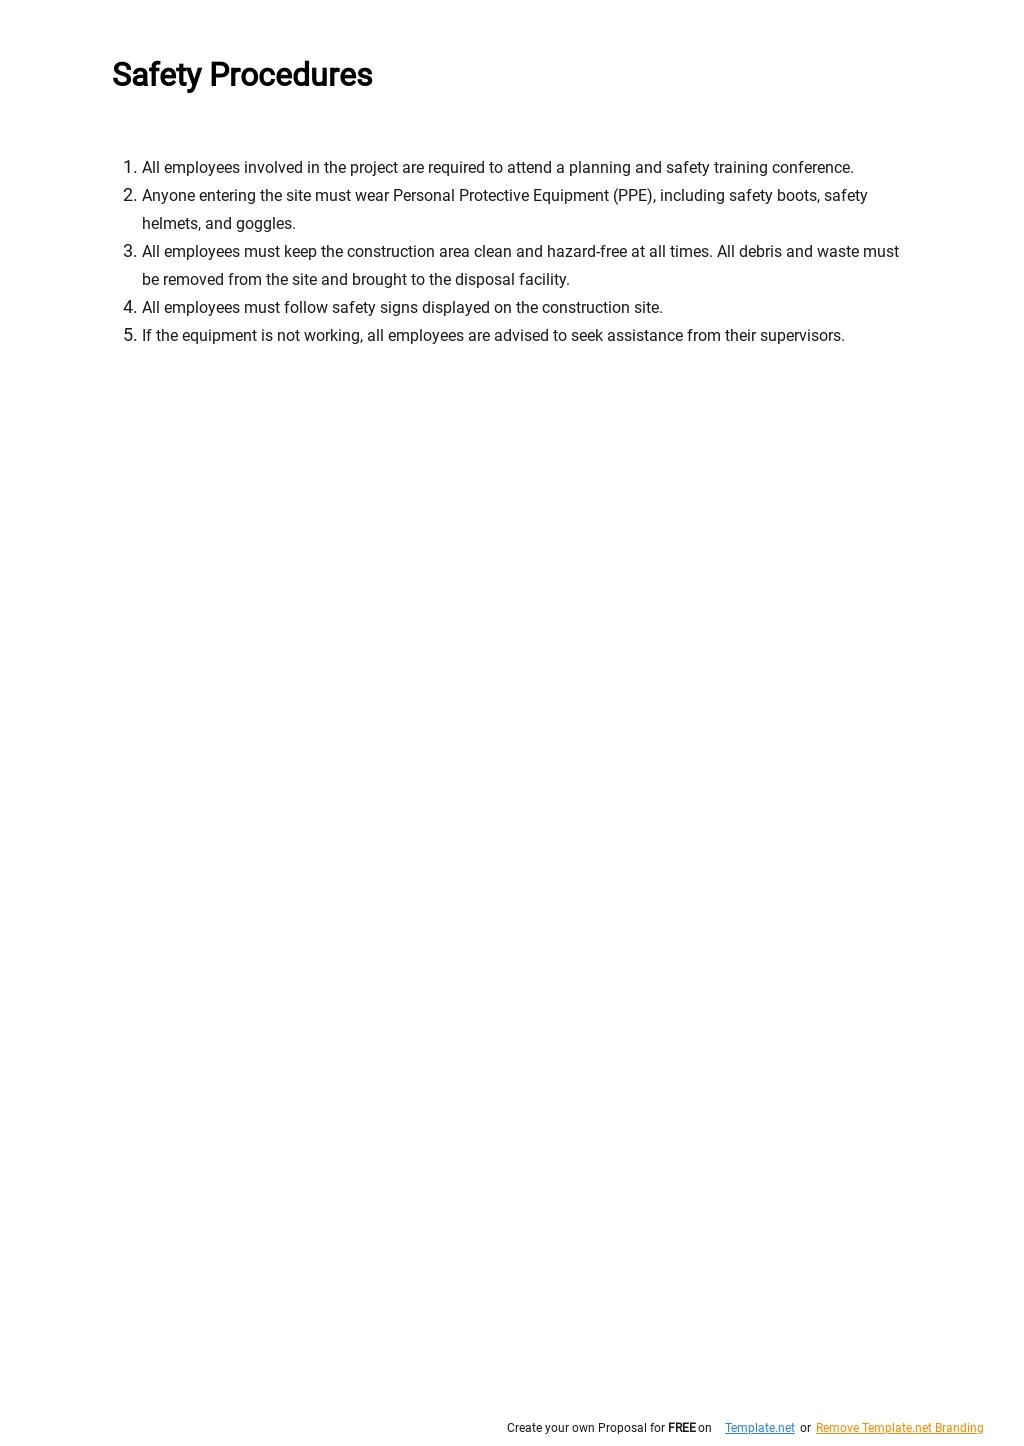 Safety Plan Template 4.jpe